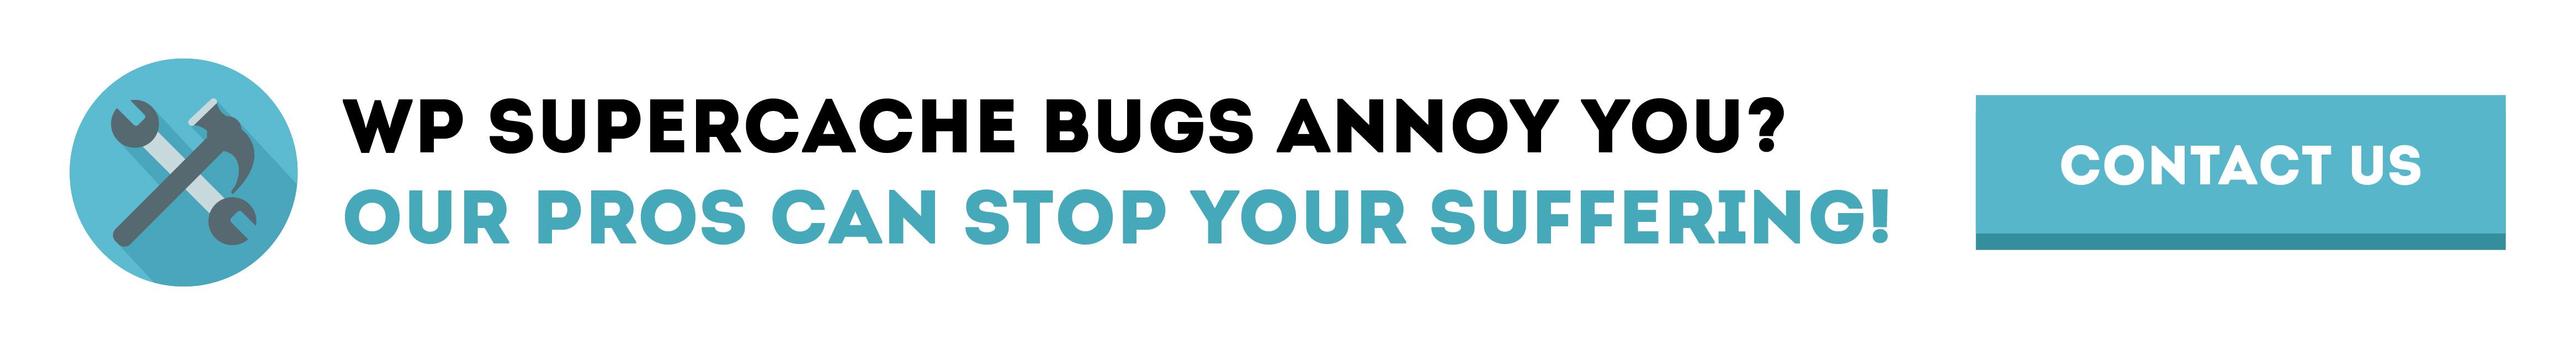 wp supercache bugs